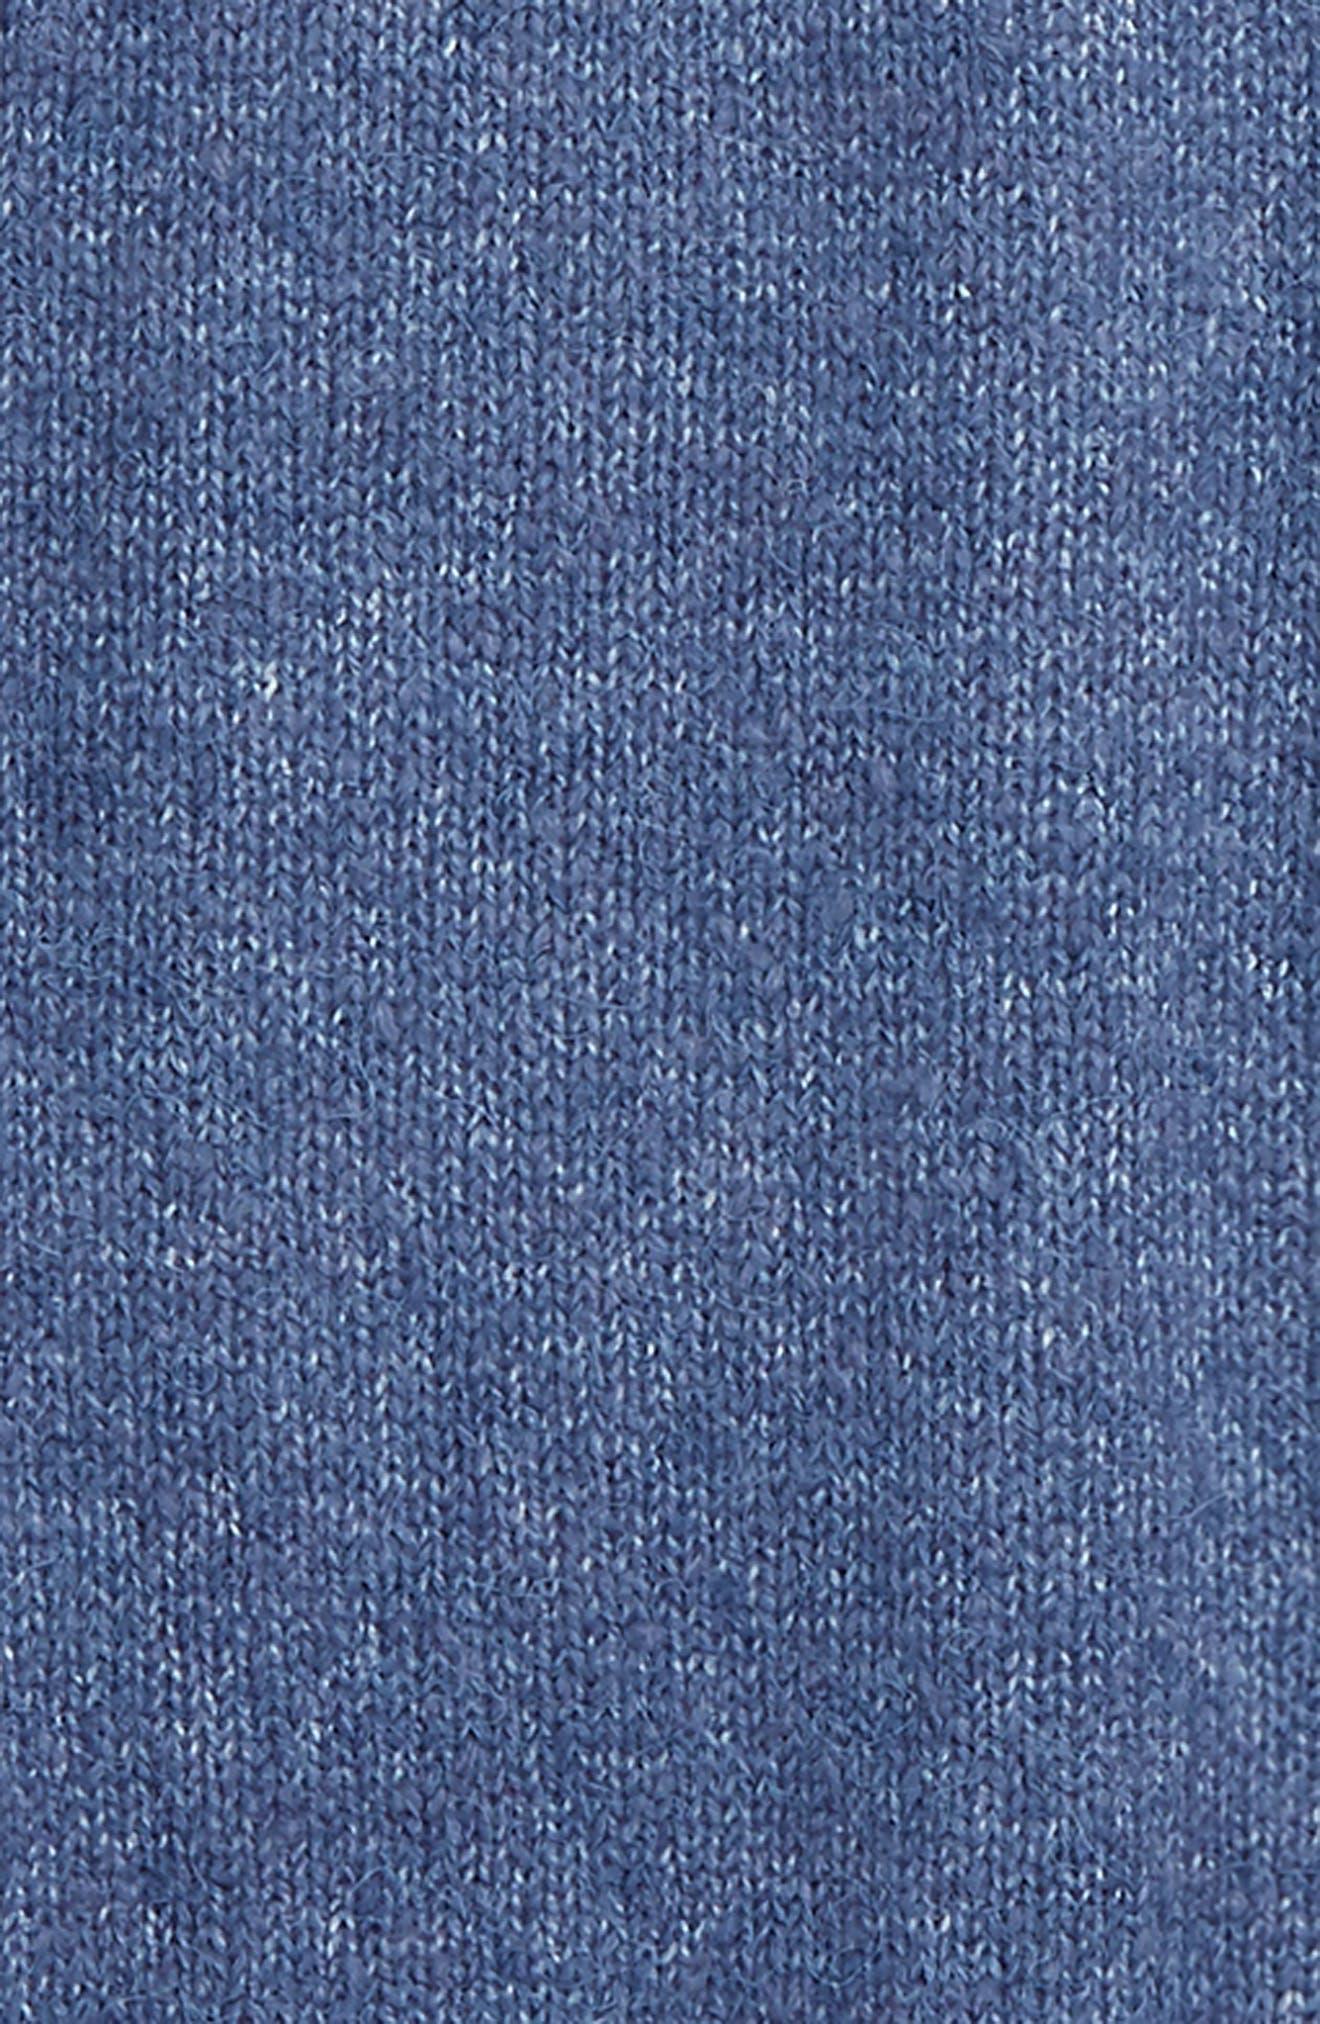 Alternate Image 2  - Tucker + Tate Colorblock Knit Sweater (Big Boys)